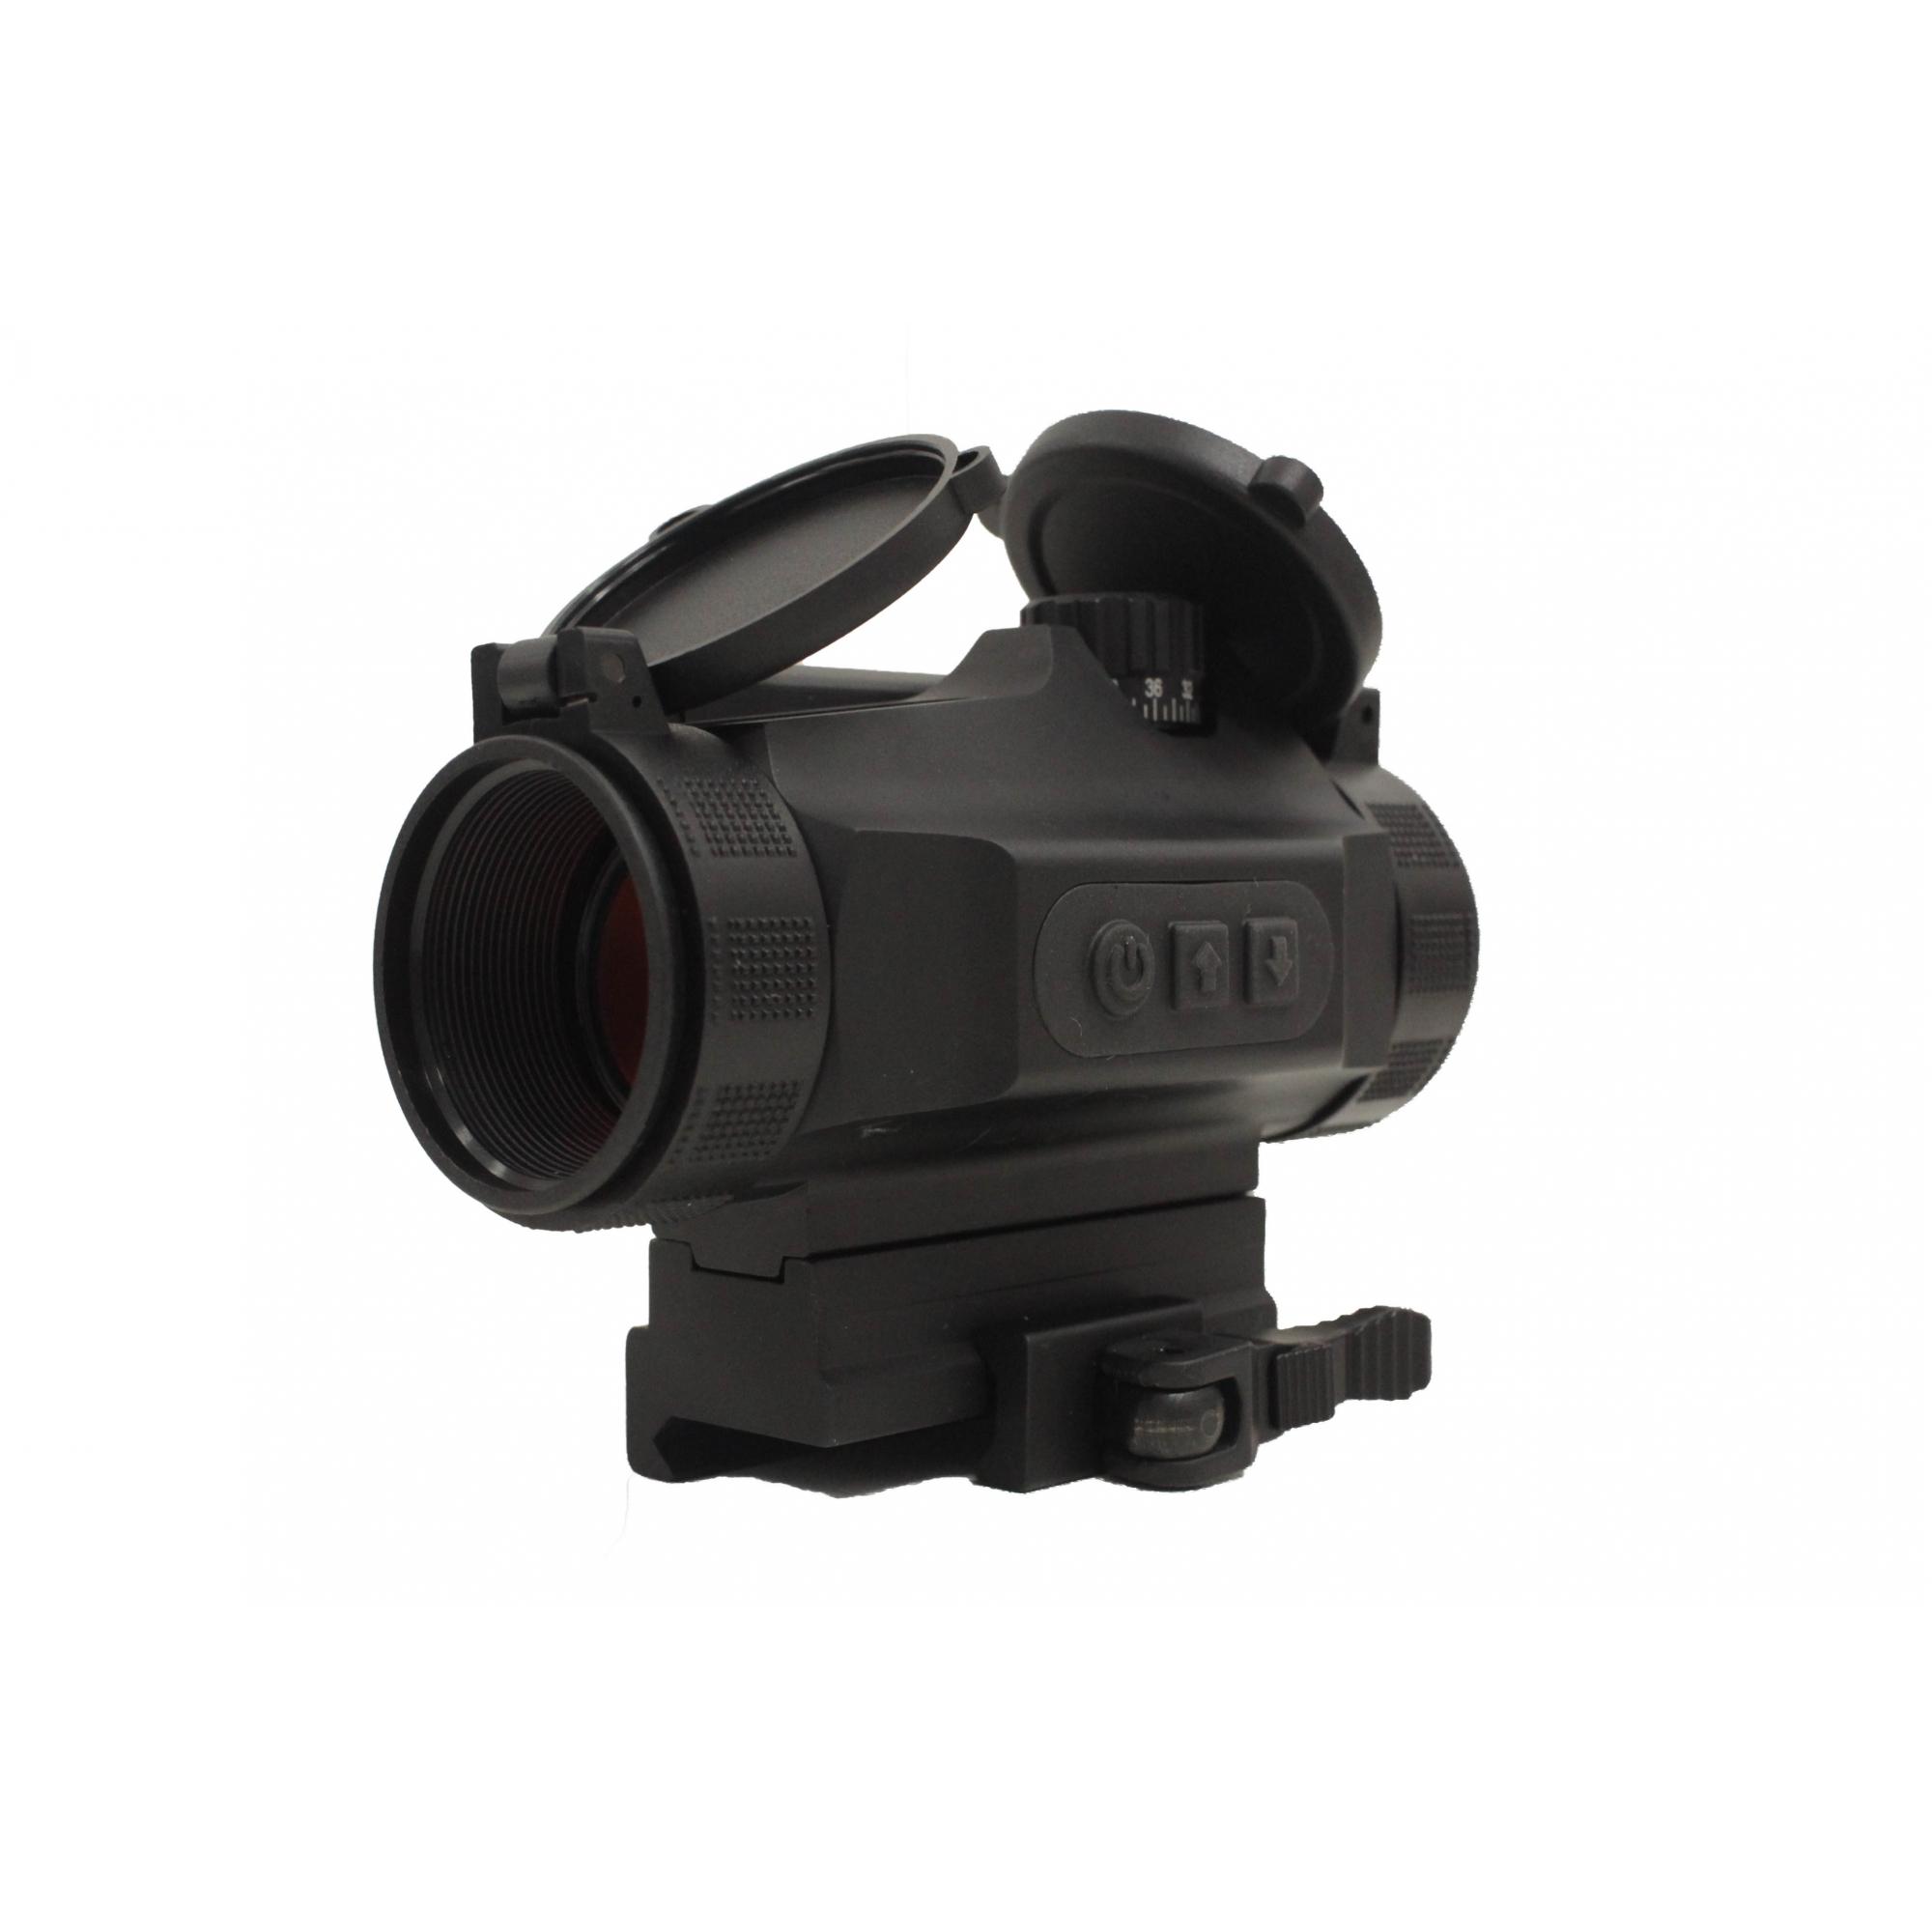 Red Dot Vector Optics Nautilus QD 1x30 SCRD-26II